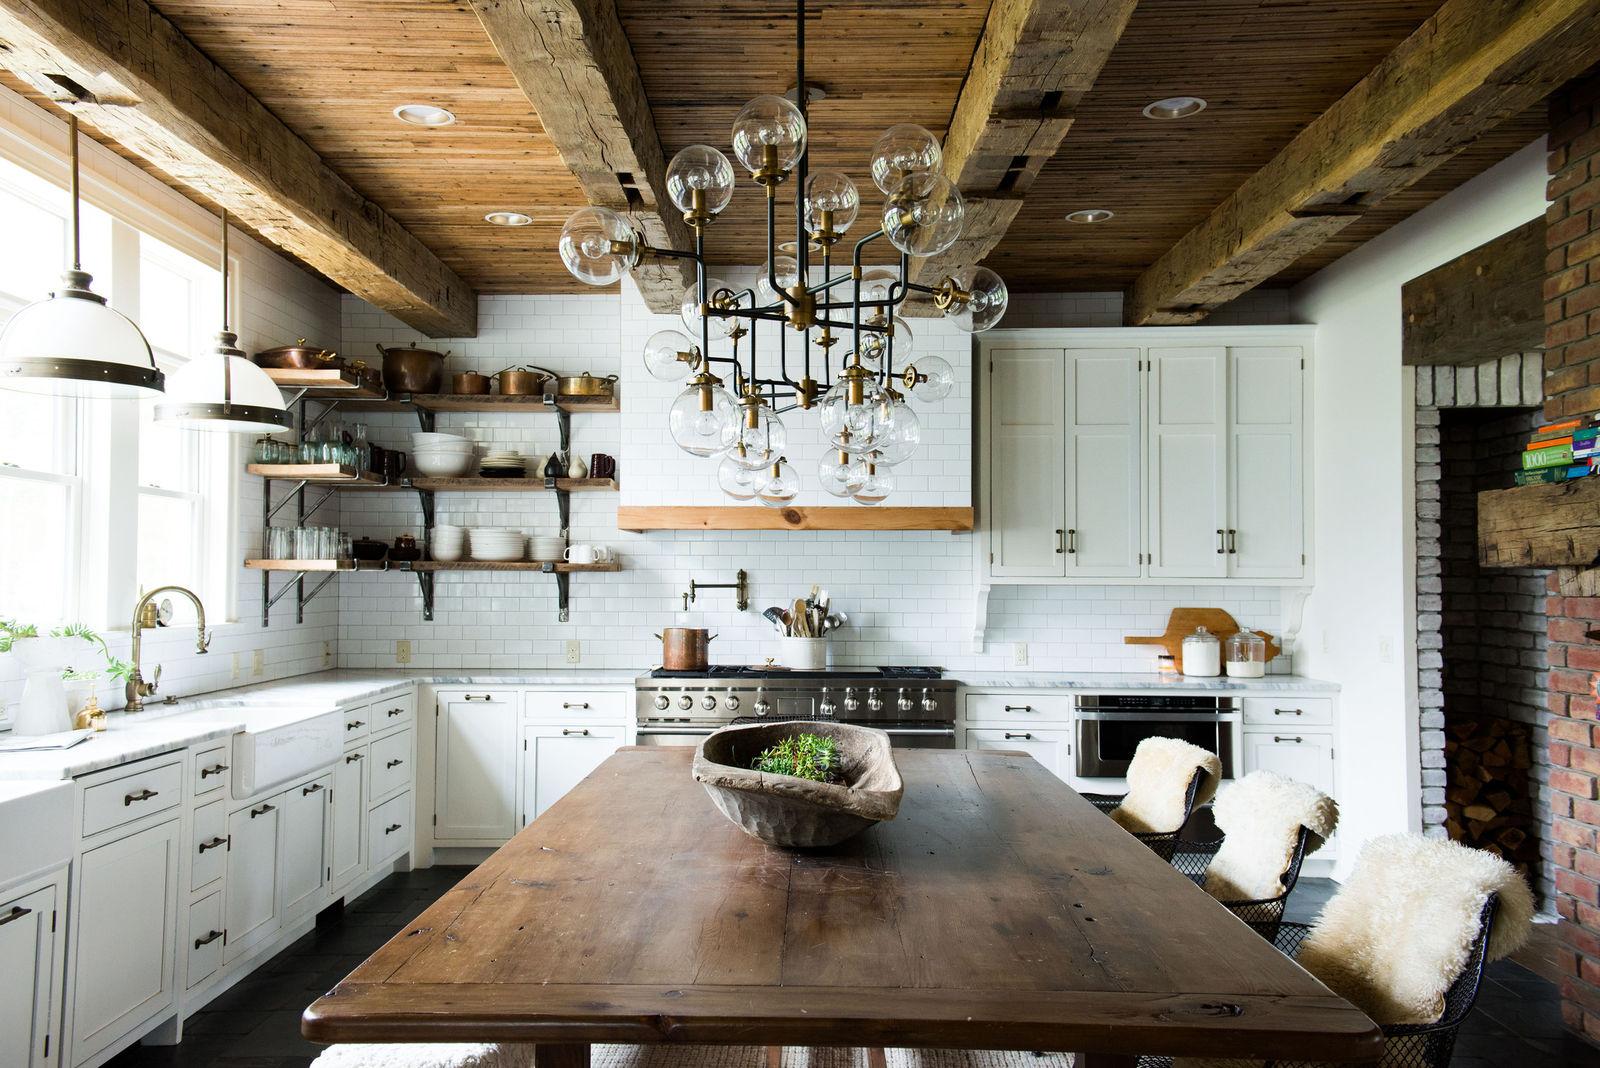 Farmhouse Kitchen with Rustic Decor & Sputnik Chandelier ... on Rustic Farmhouse Kitchen Ideas  id=80633